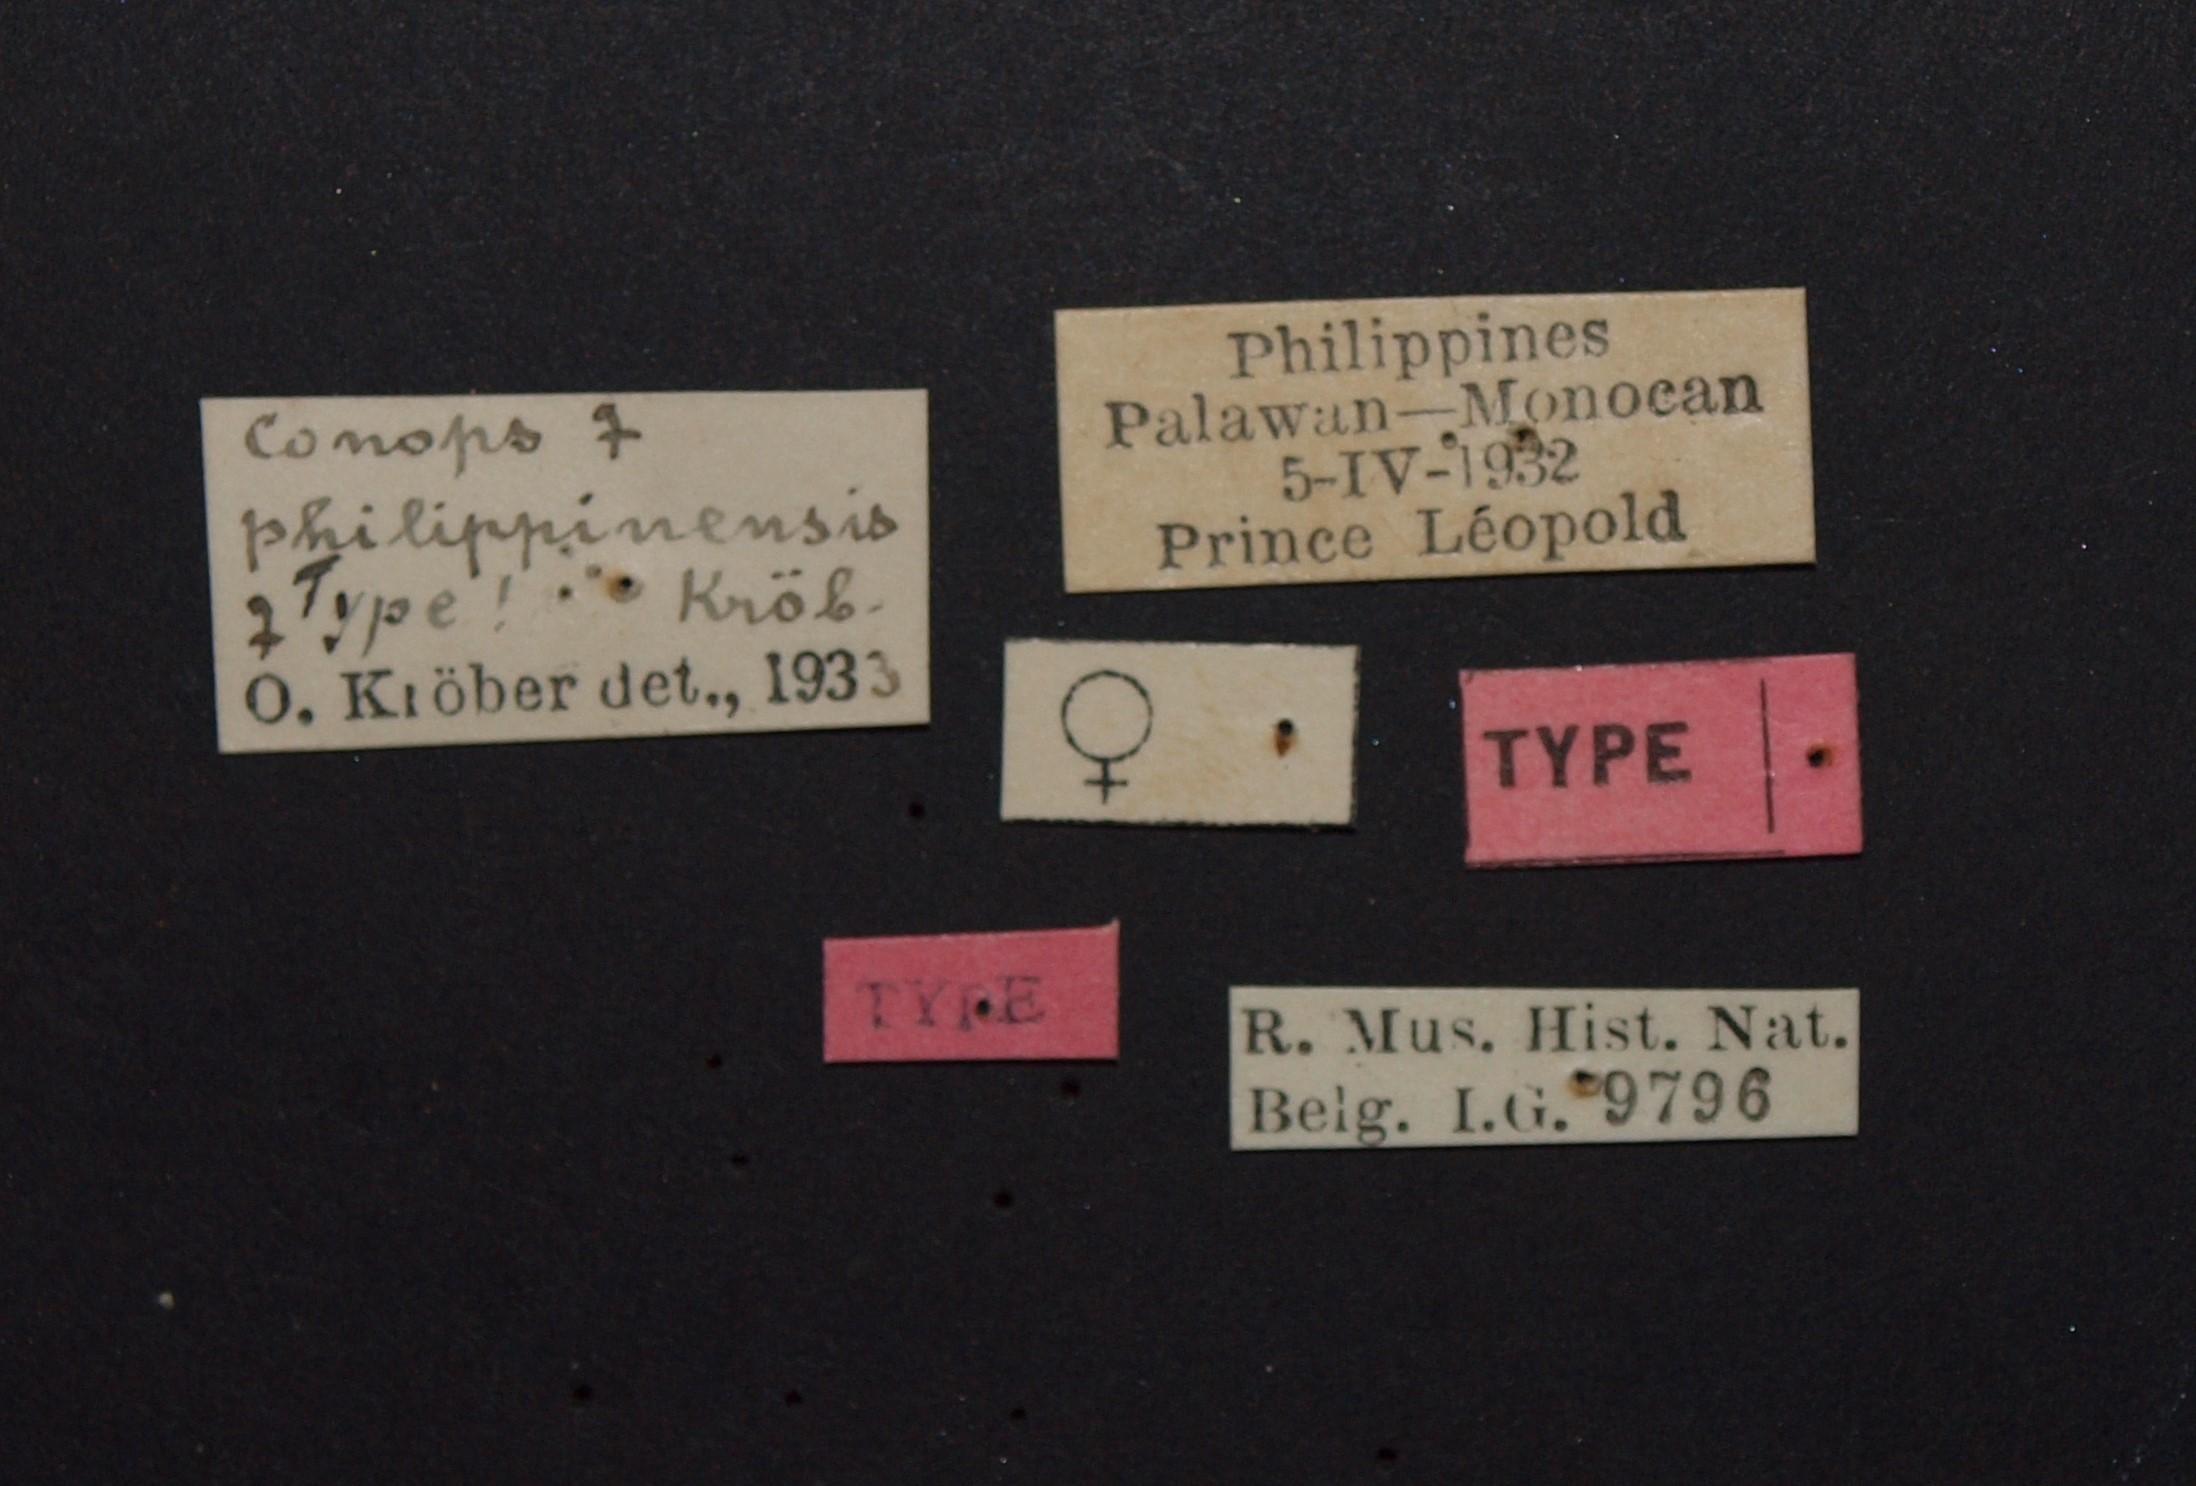 Conops philippinensis t.JPG